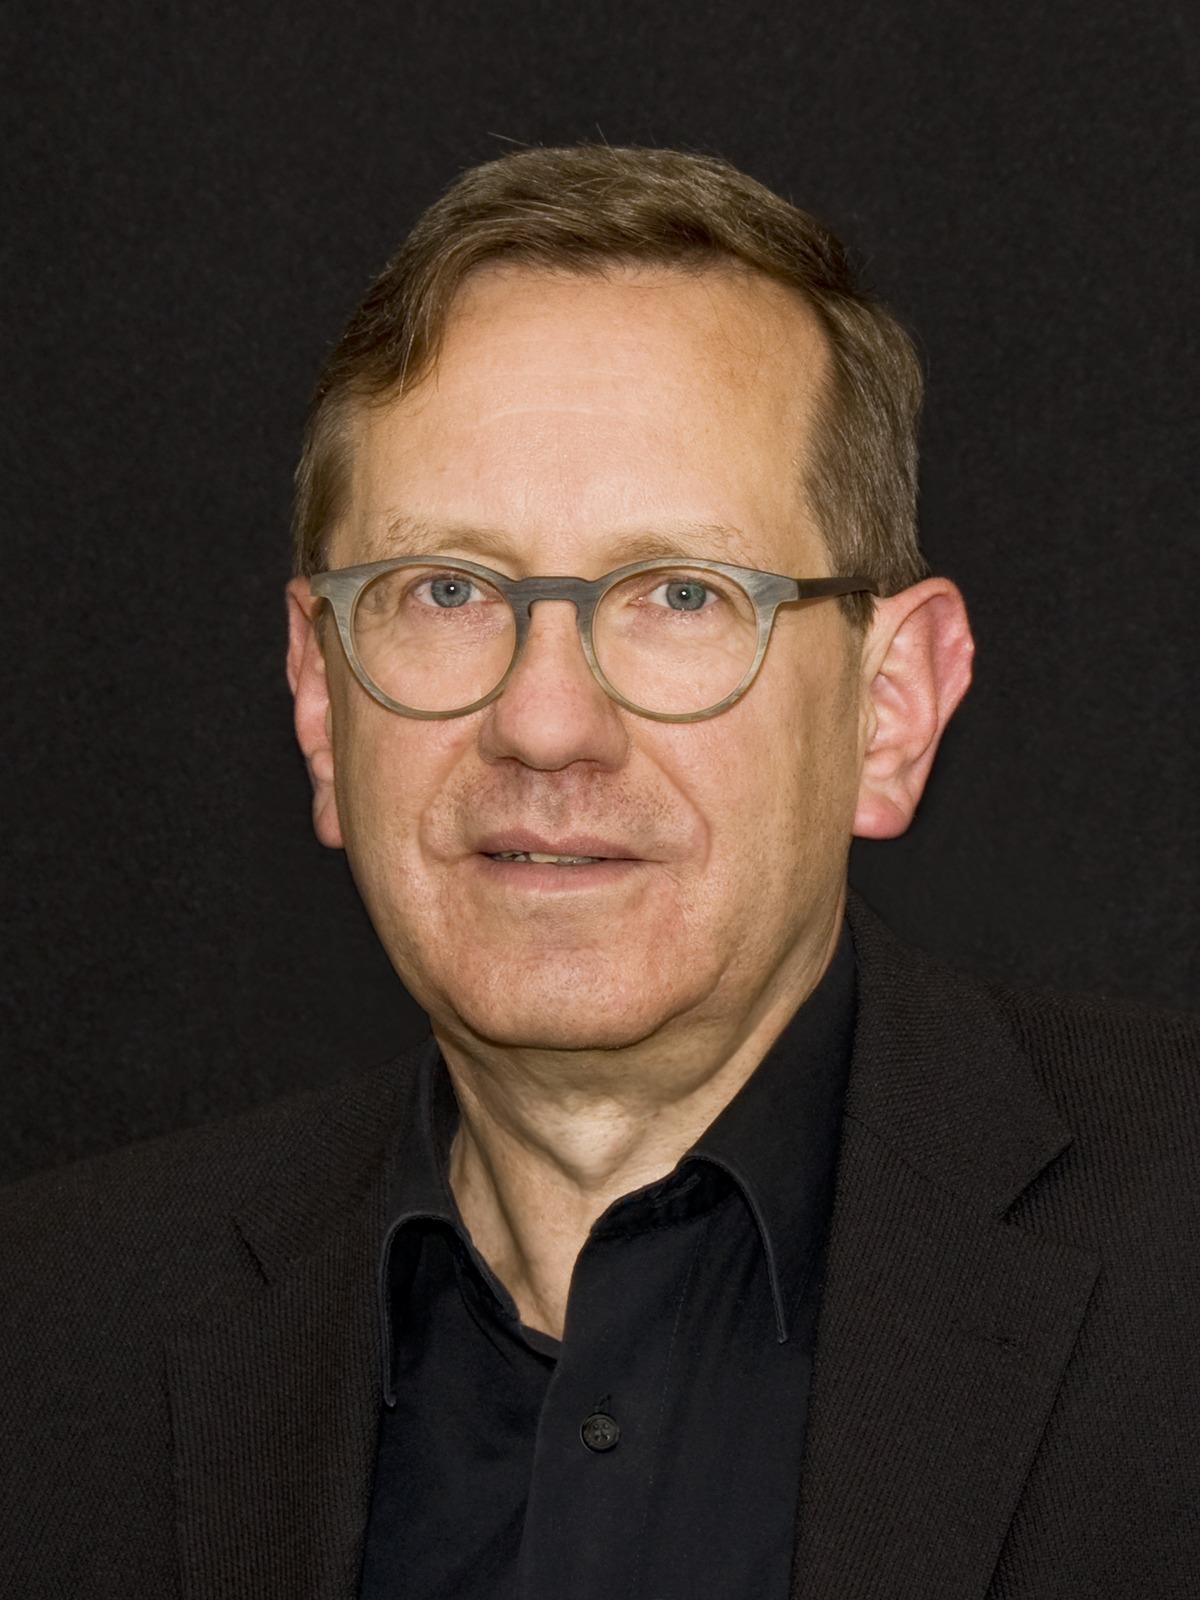 Friedemann Beyer – Wikipedia